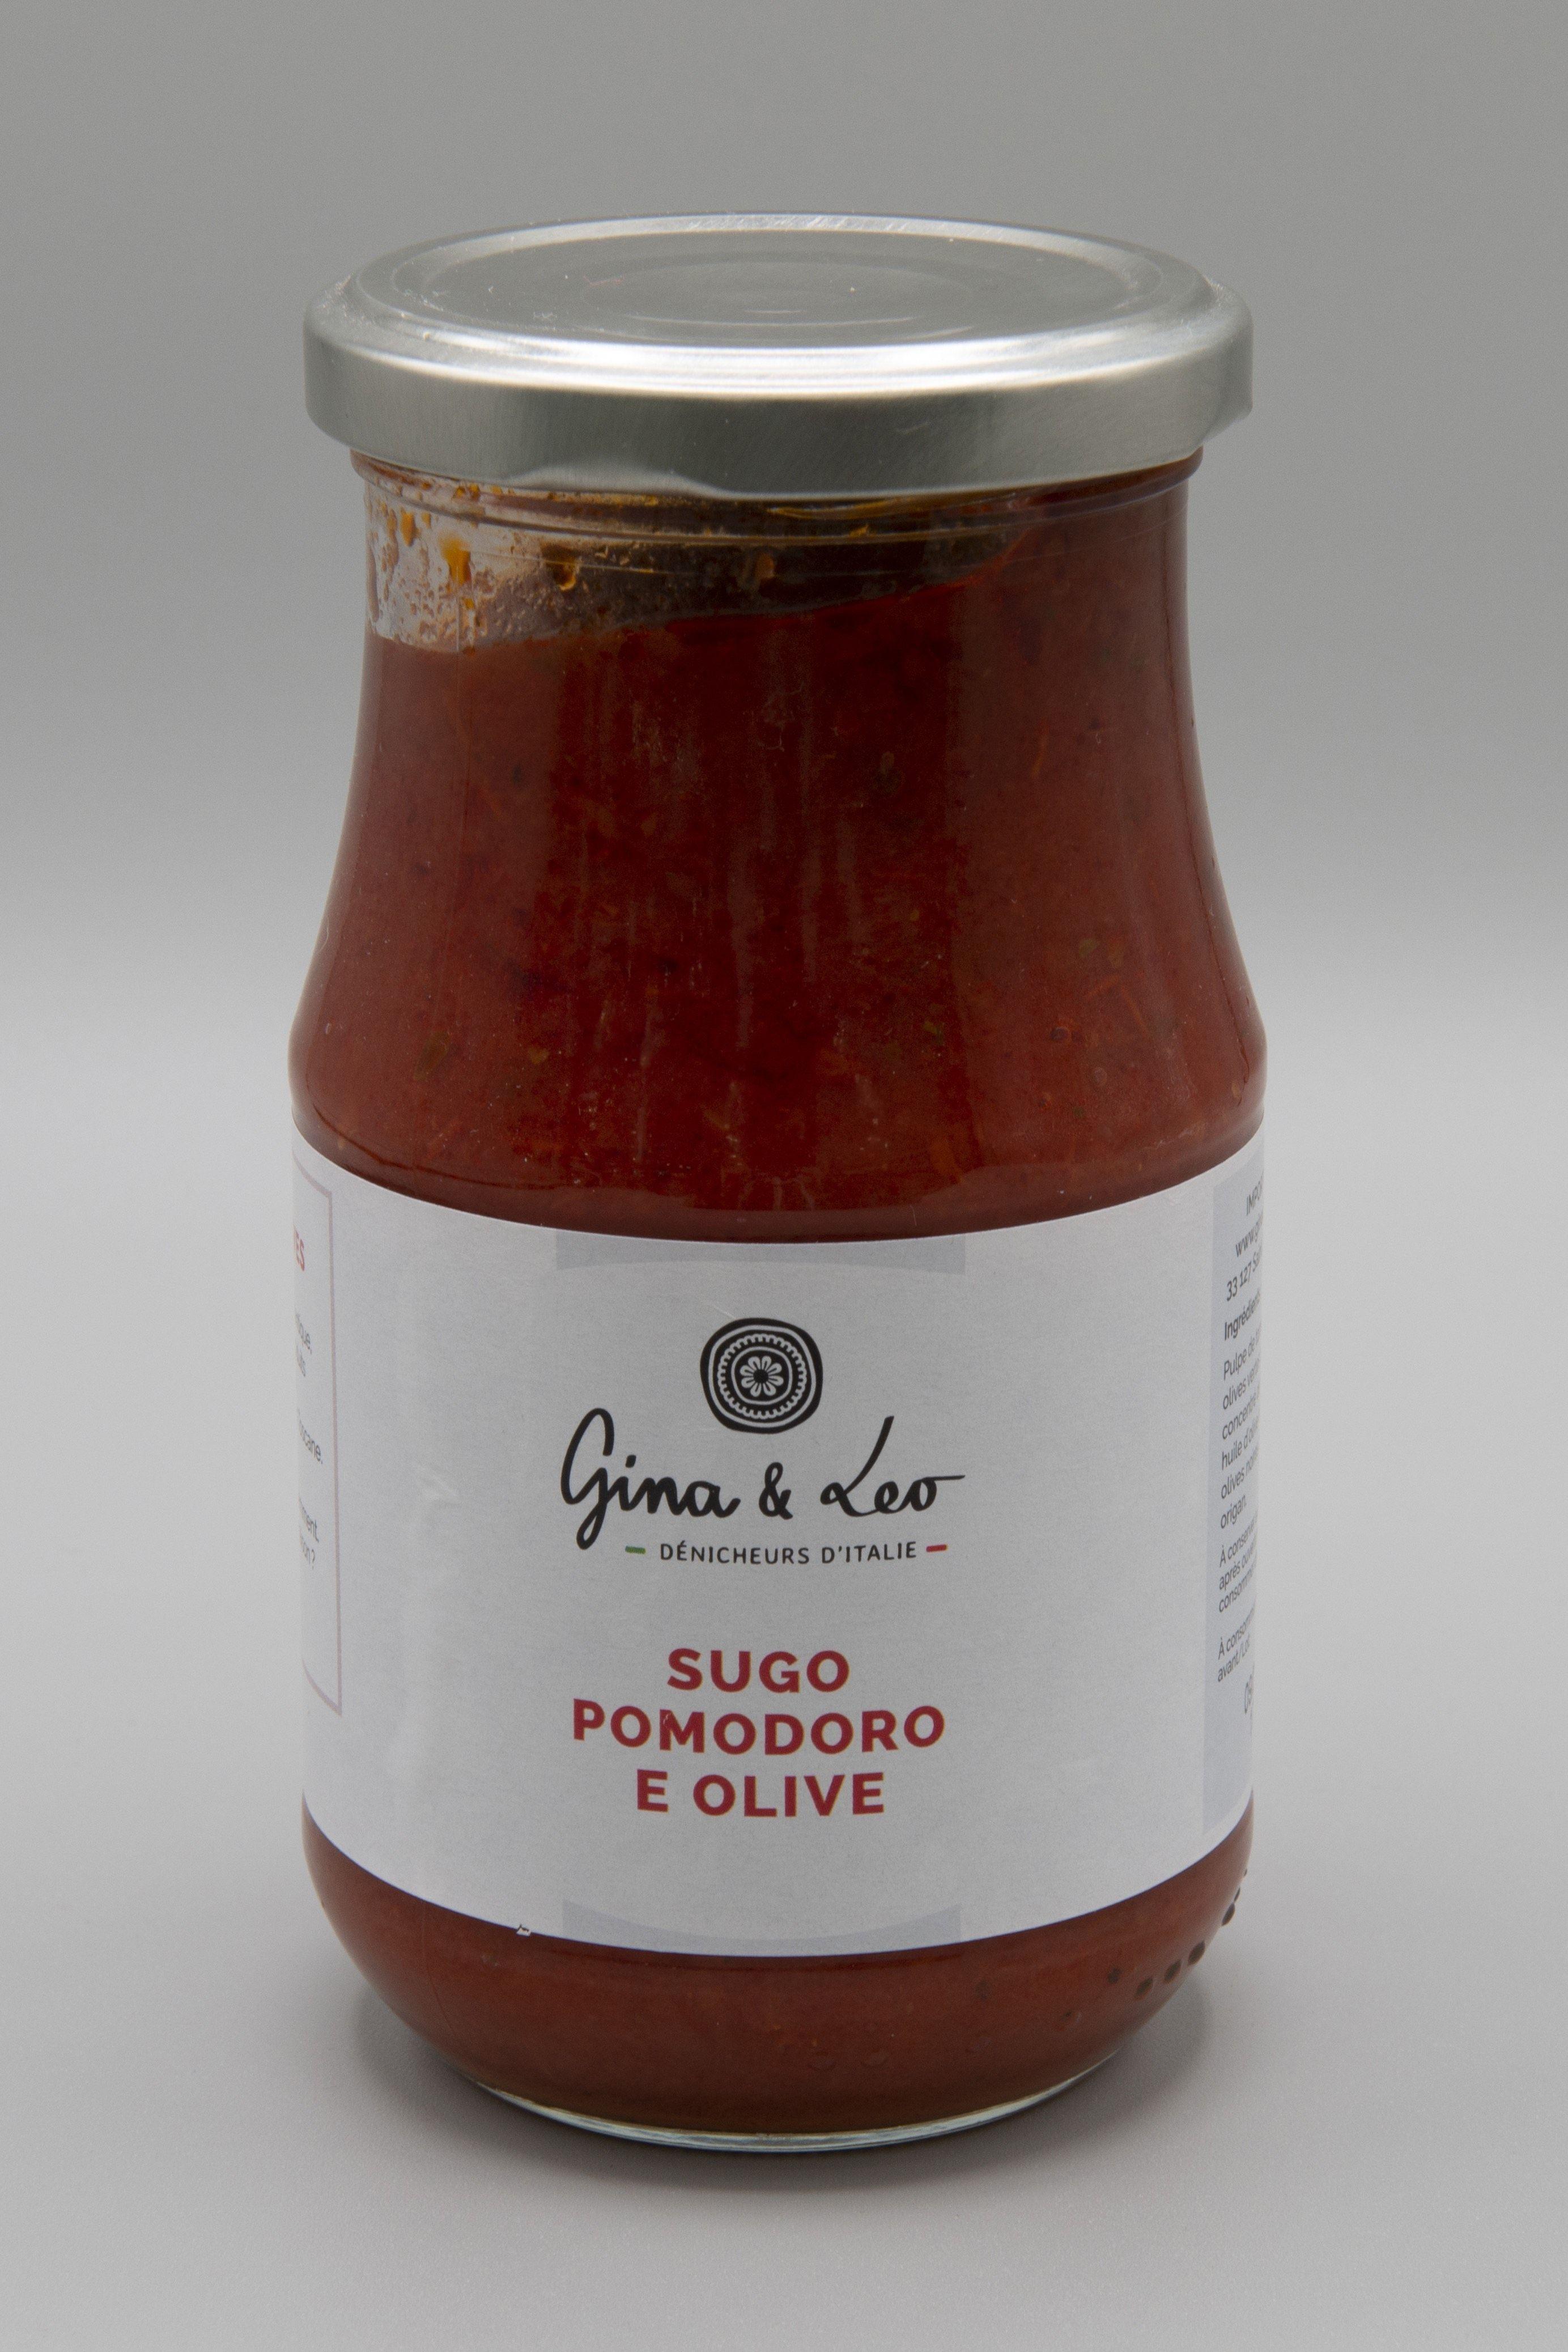 achat-sauce-Gina-leo-sugo-pomodoro-olive-pot-epicerie-nice